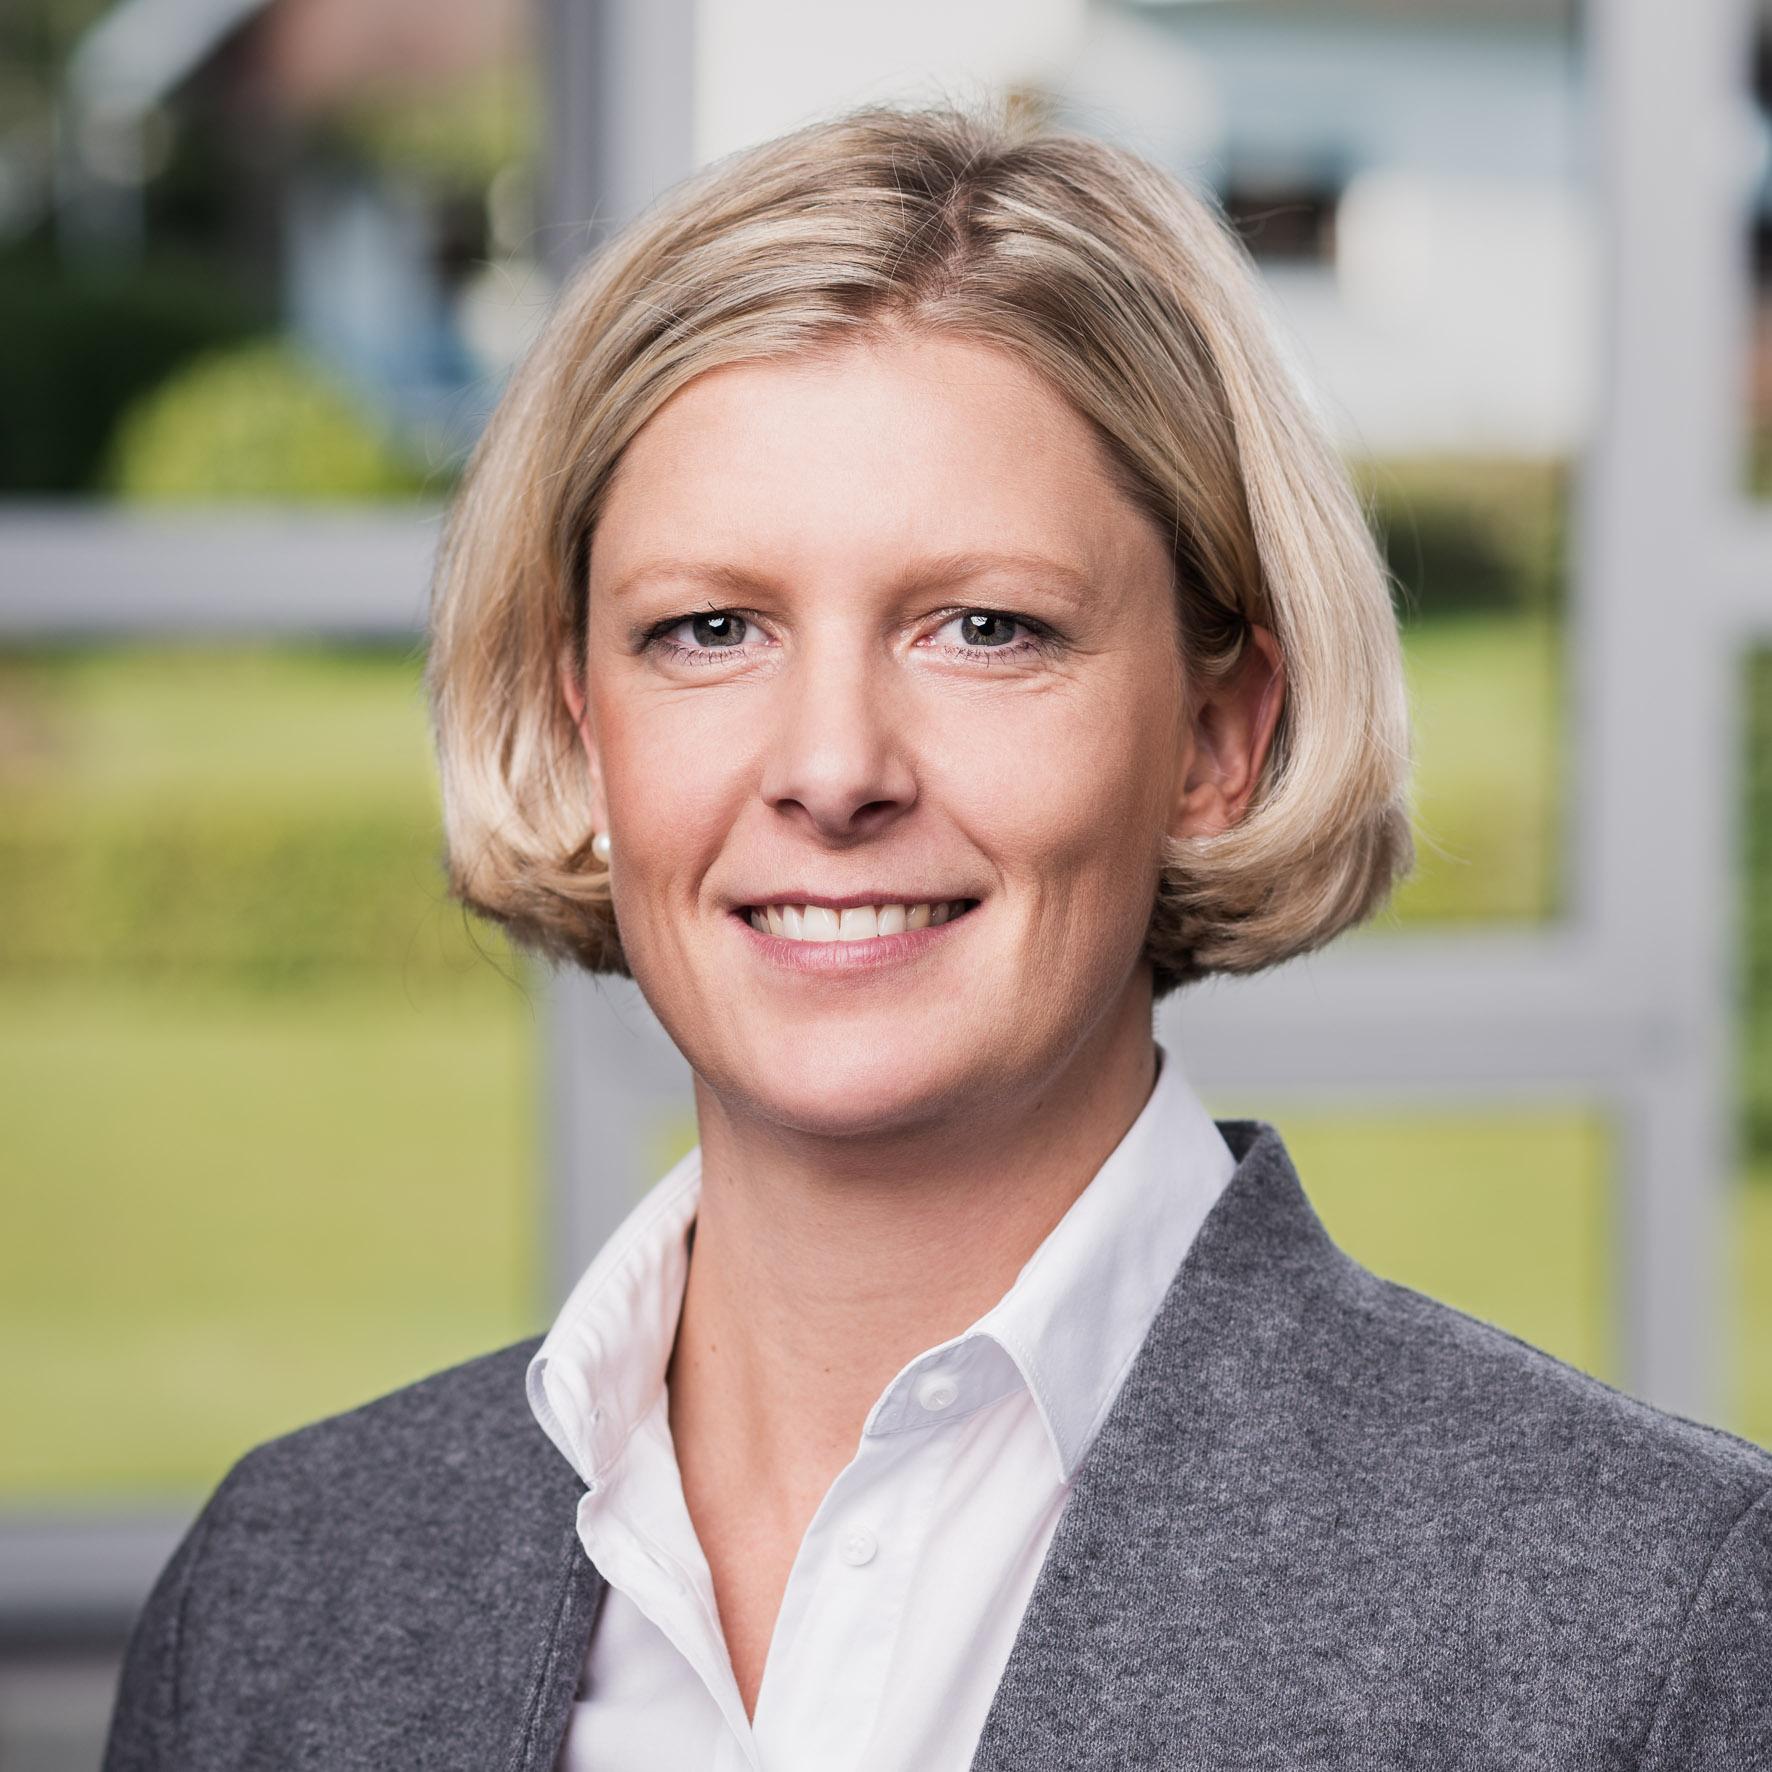 Nathalie Klinkenberg